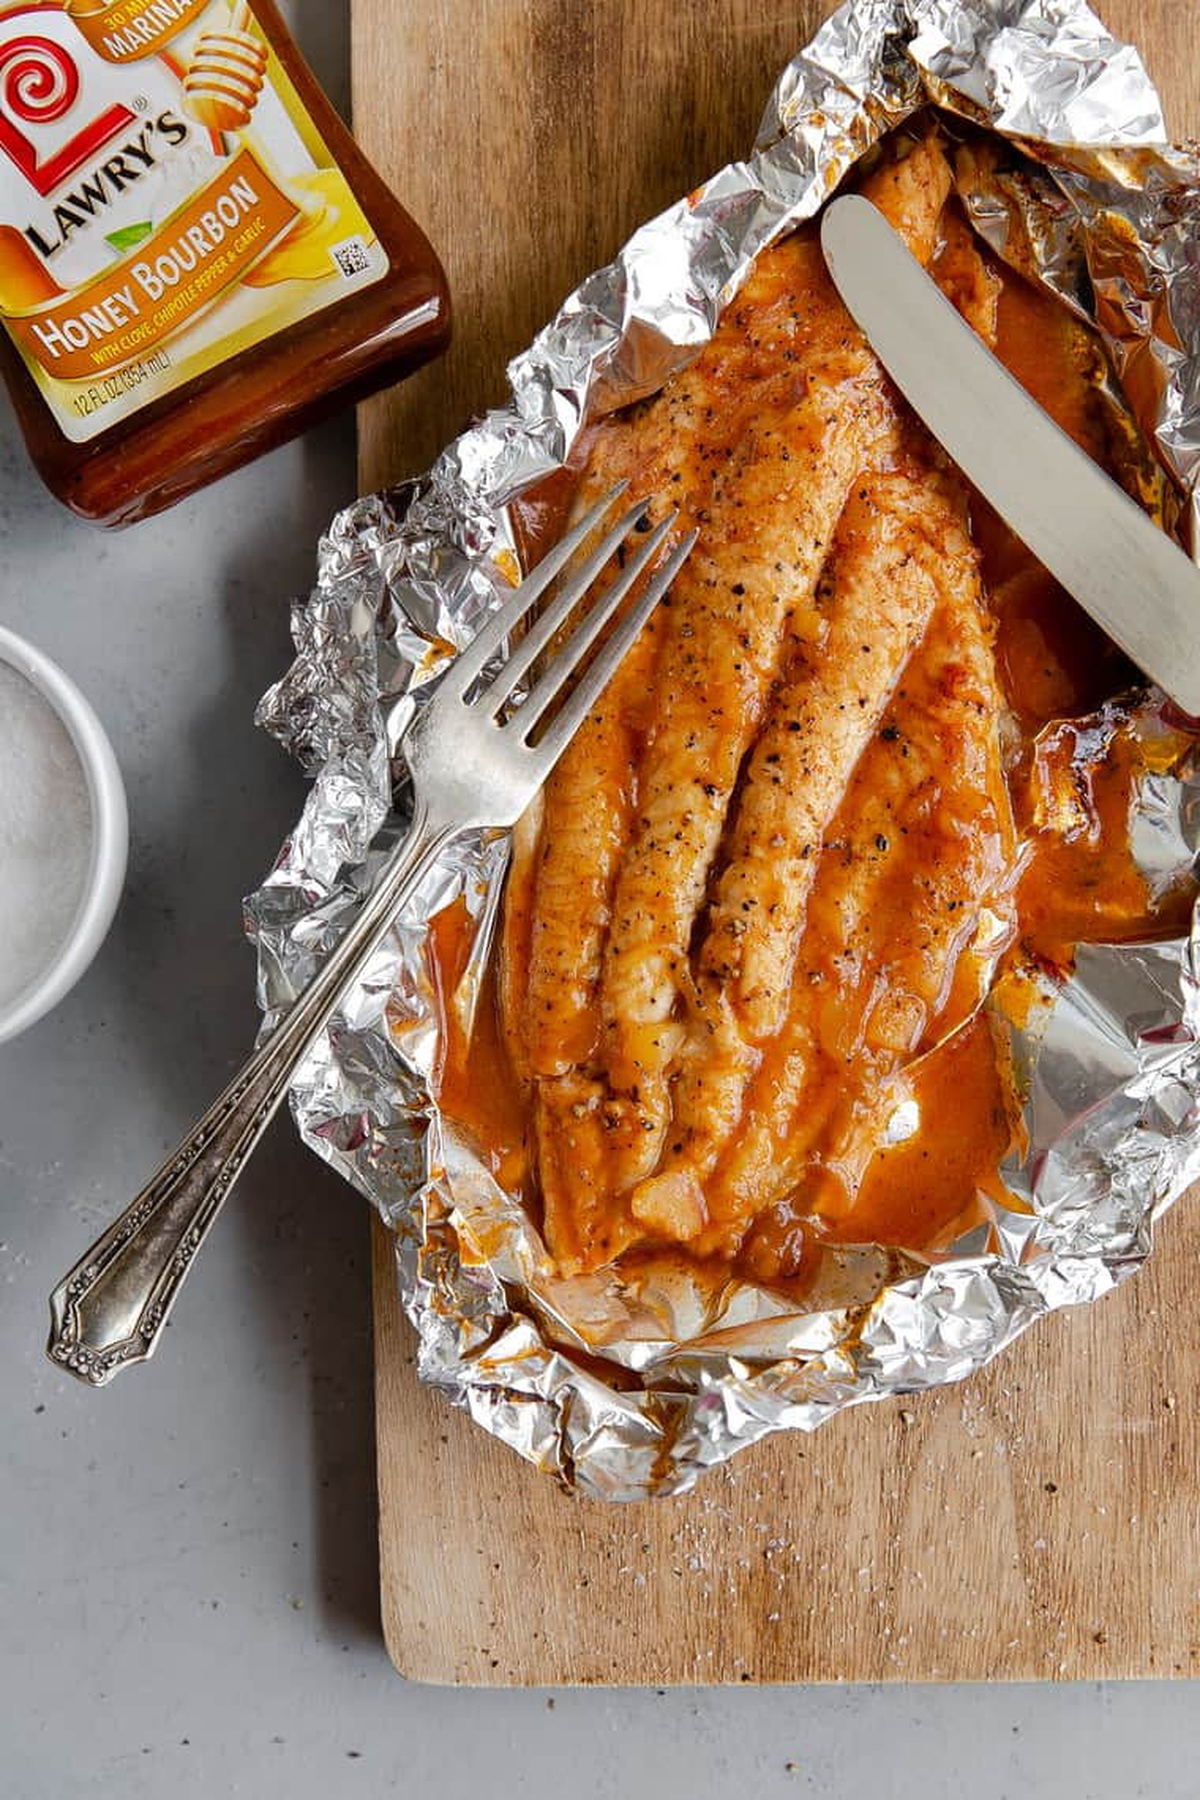 Grilling catfish in foil